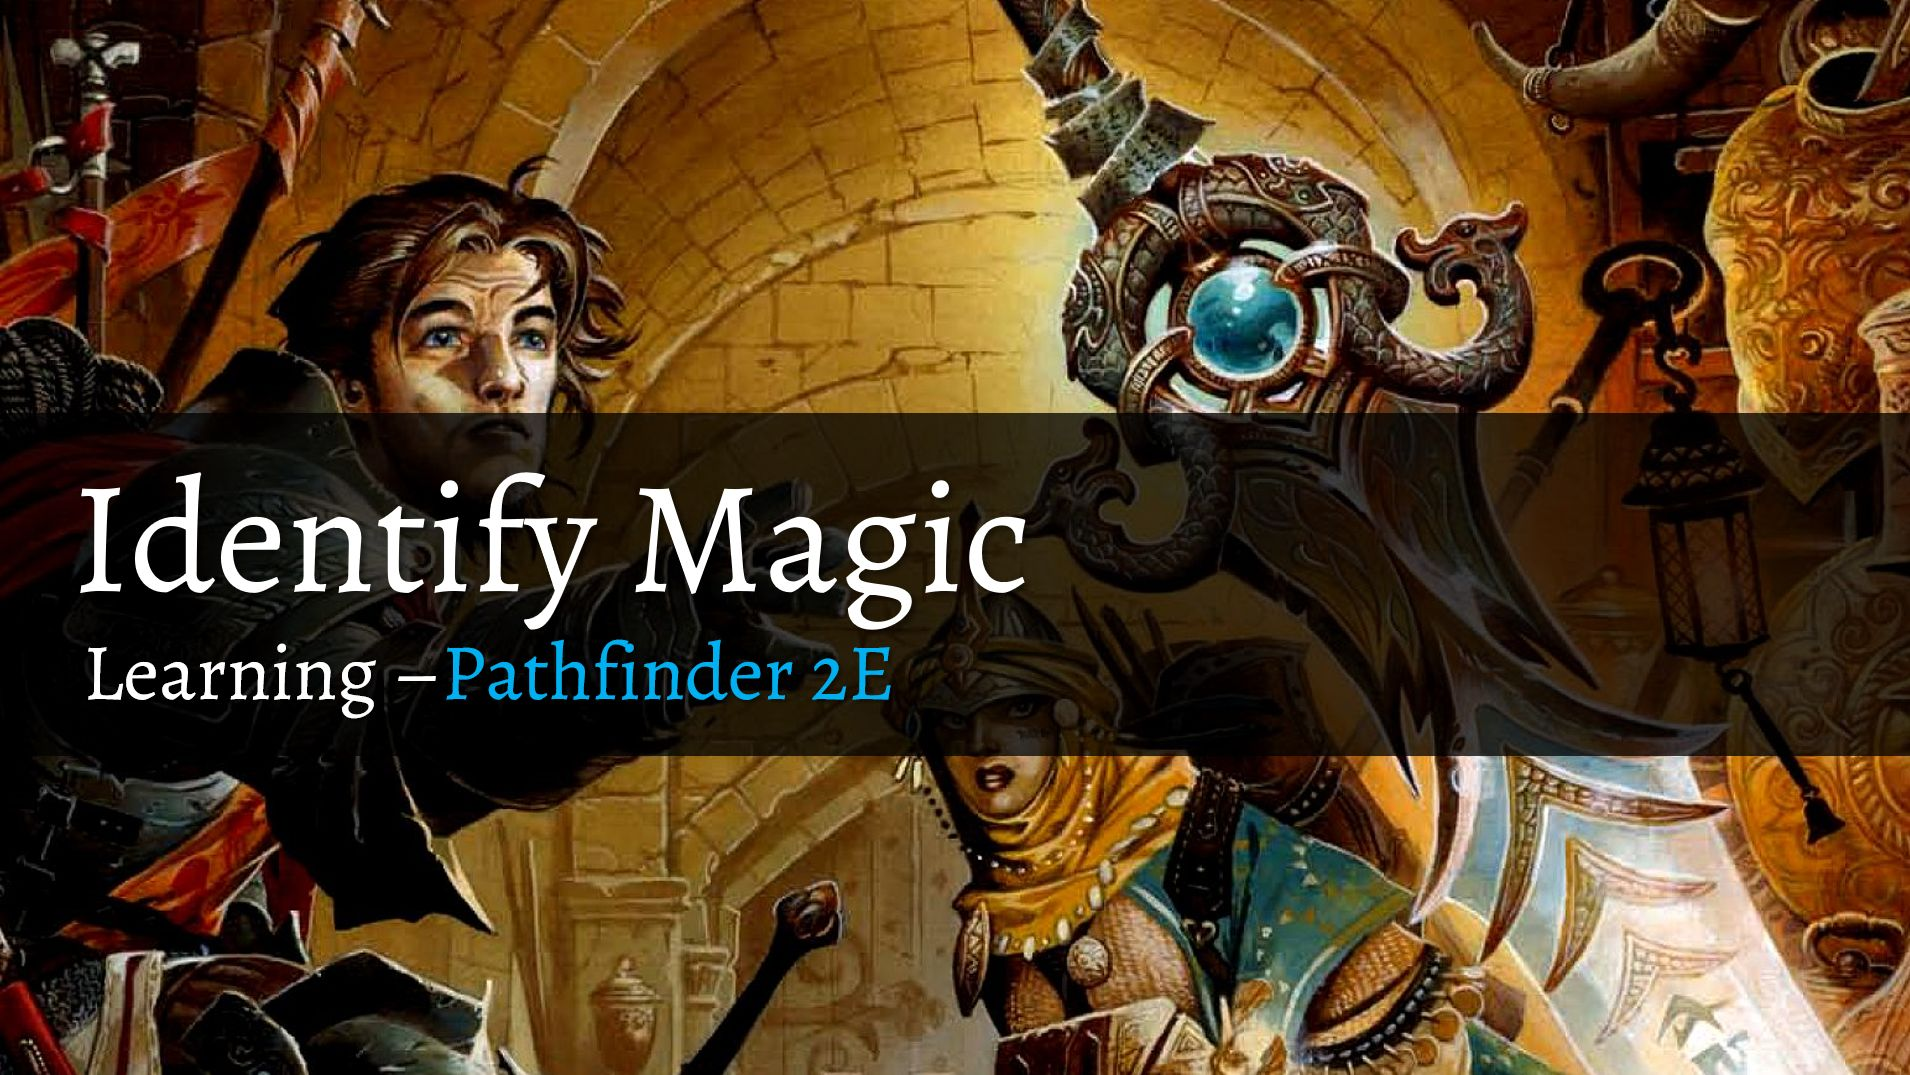 Identify Magic Cover_2.jpg